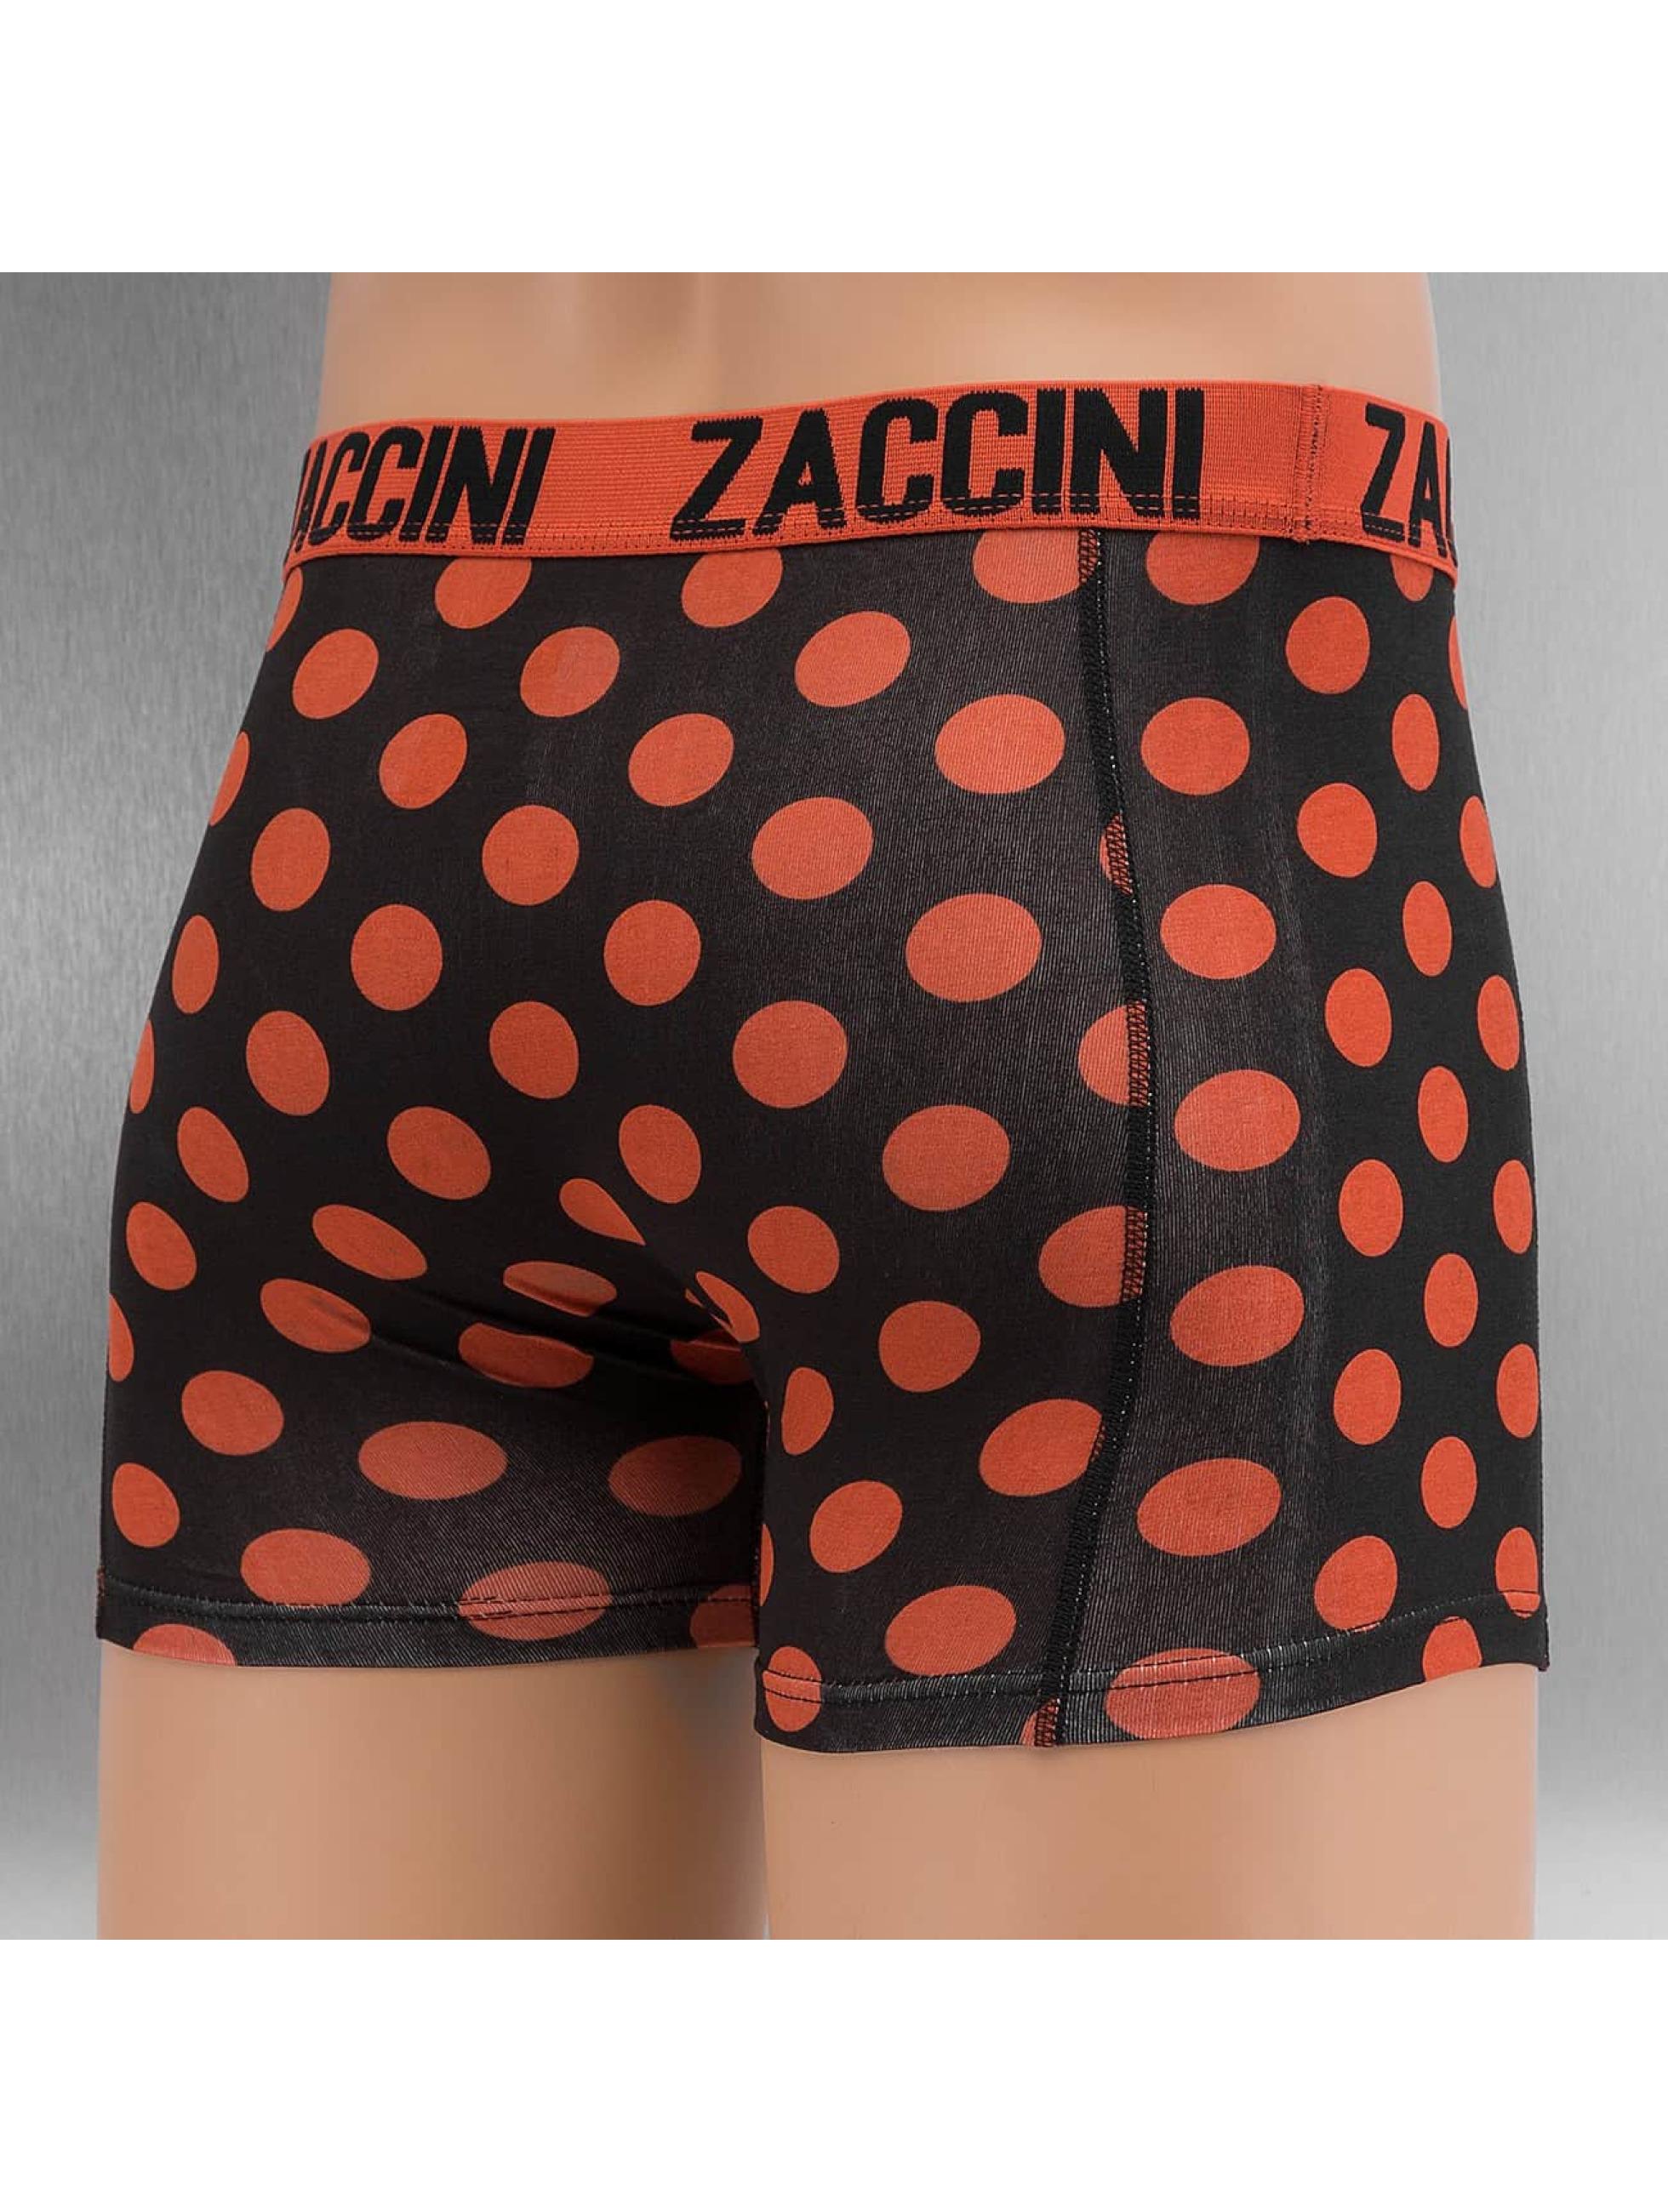 Zaccini Boxer Short Royal Dots orange